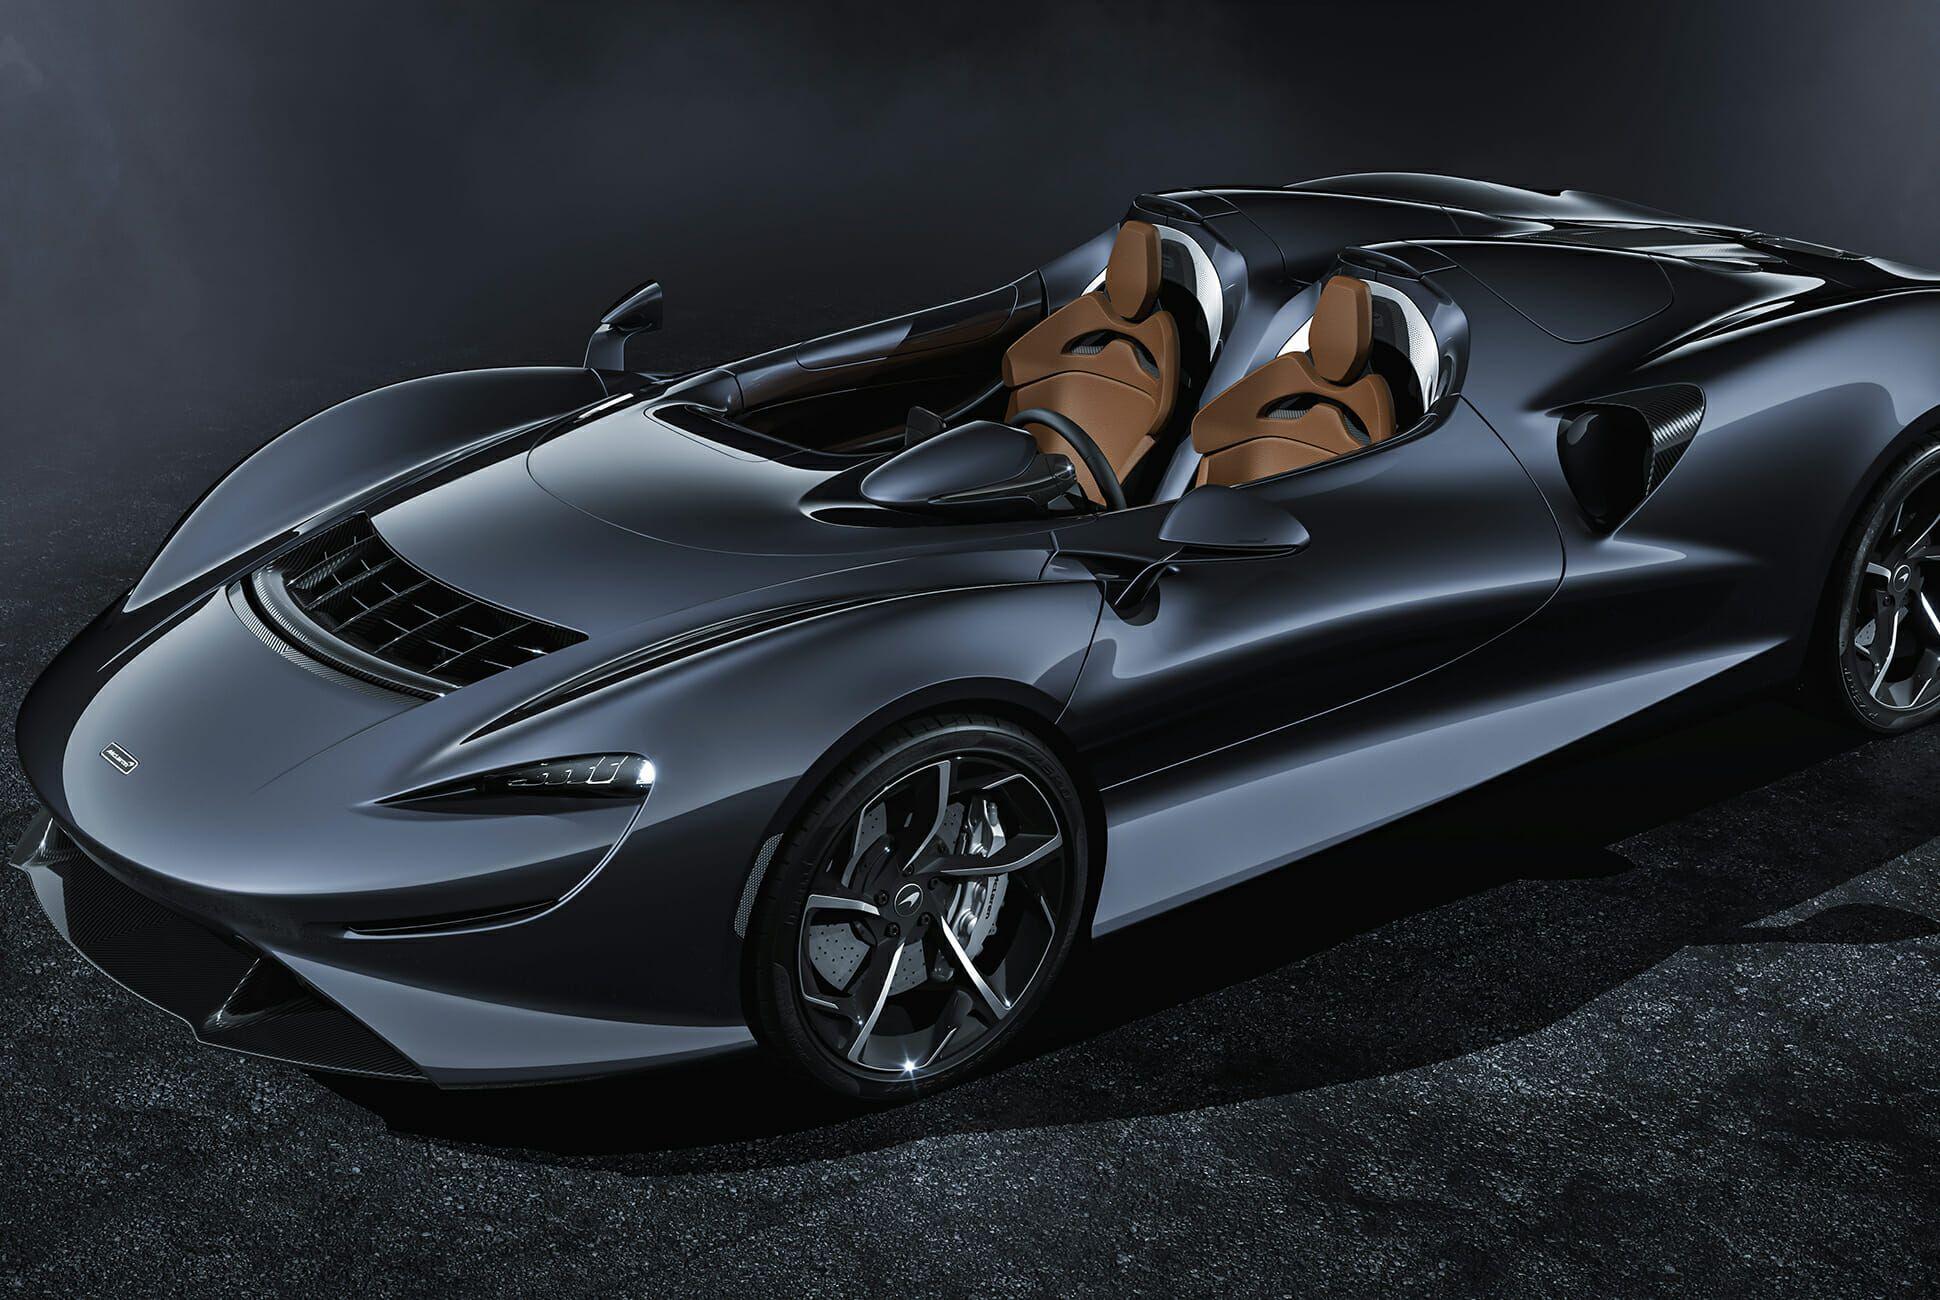 McLaren's New Car Costs $1.69M, But You Don't Get Windows